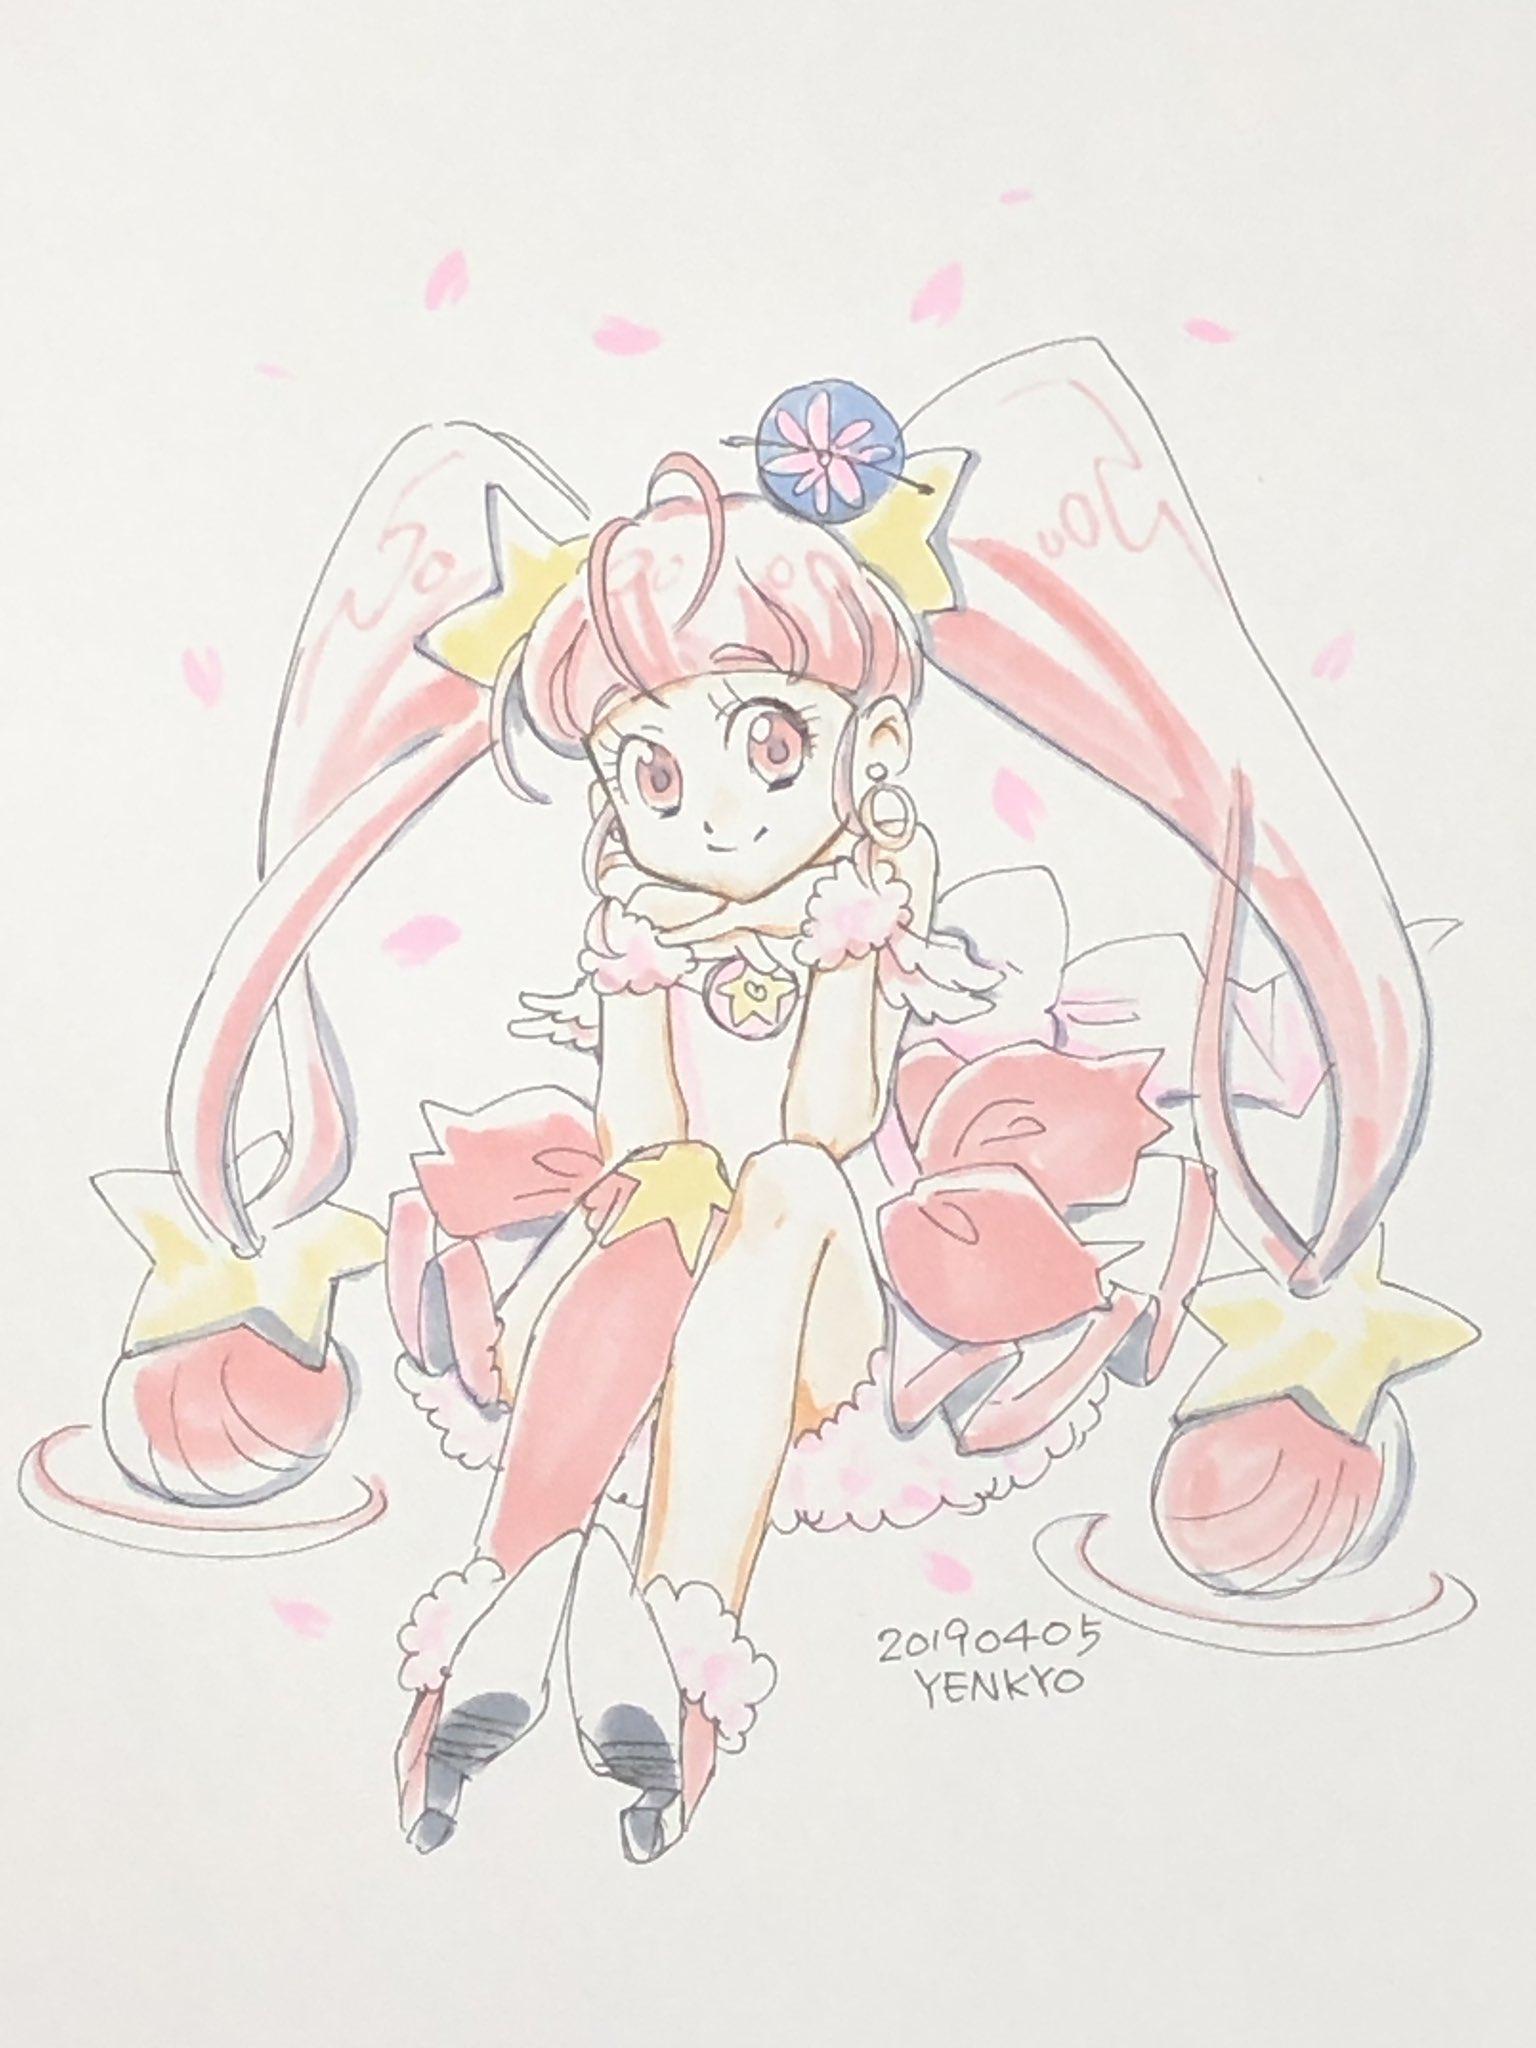 yenkyo@レイフレJ13 (@yenkyo)さんのイラスト